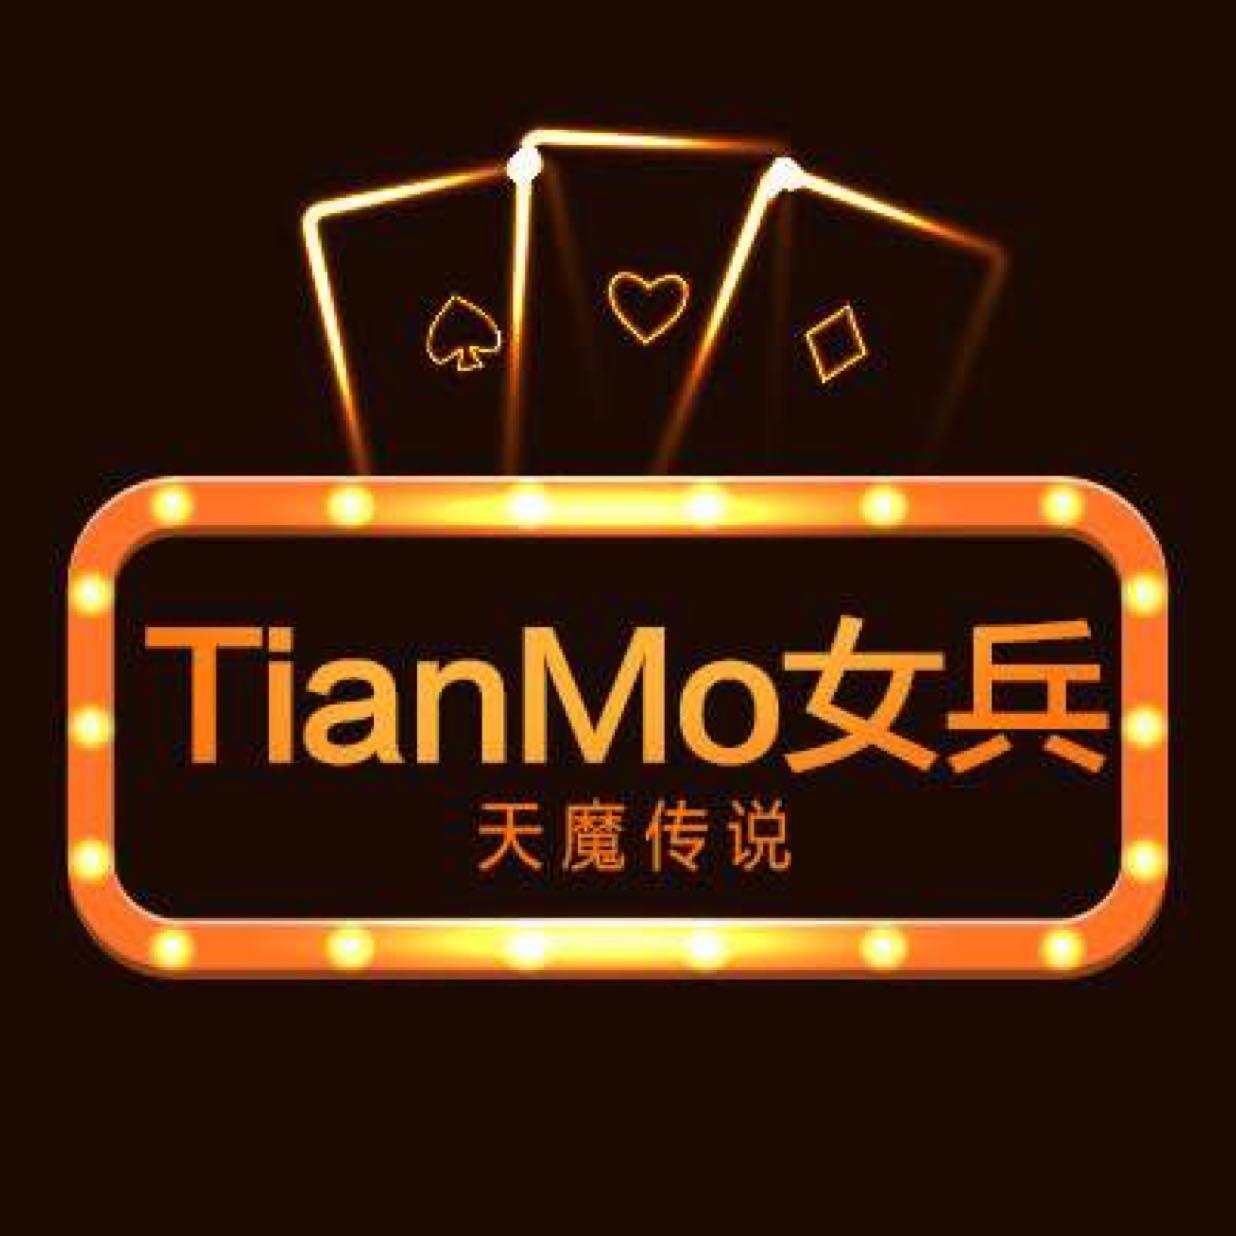 TianMo,女兵❤️不卑不亢